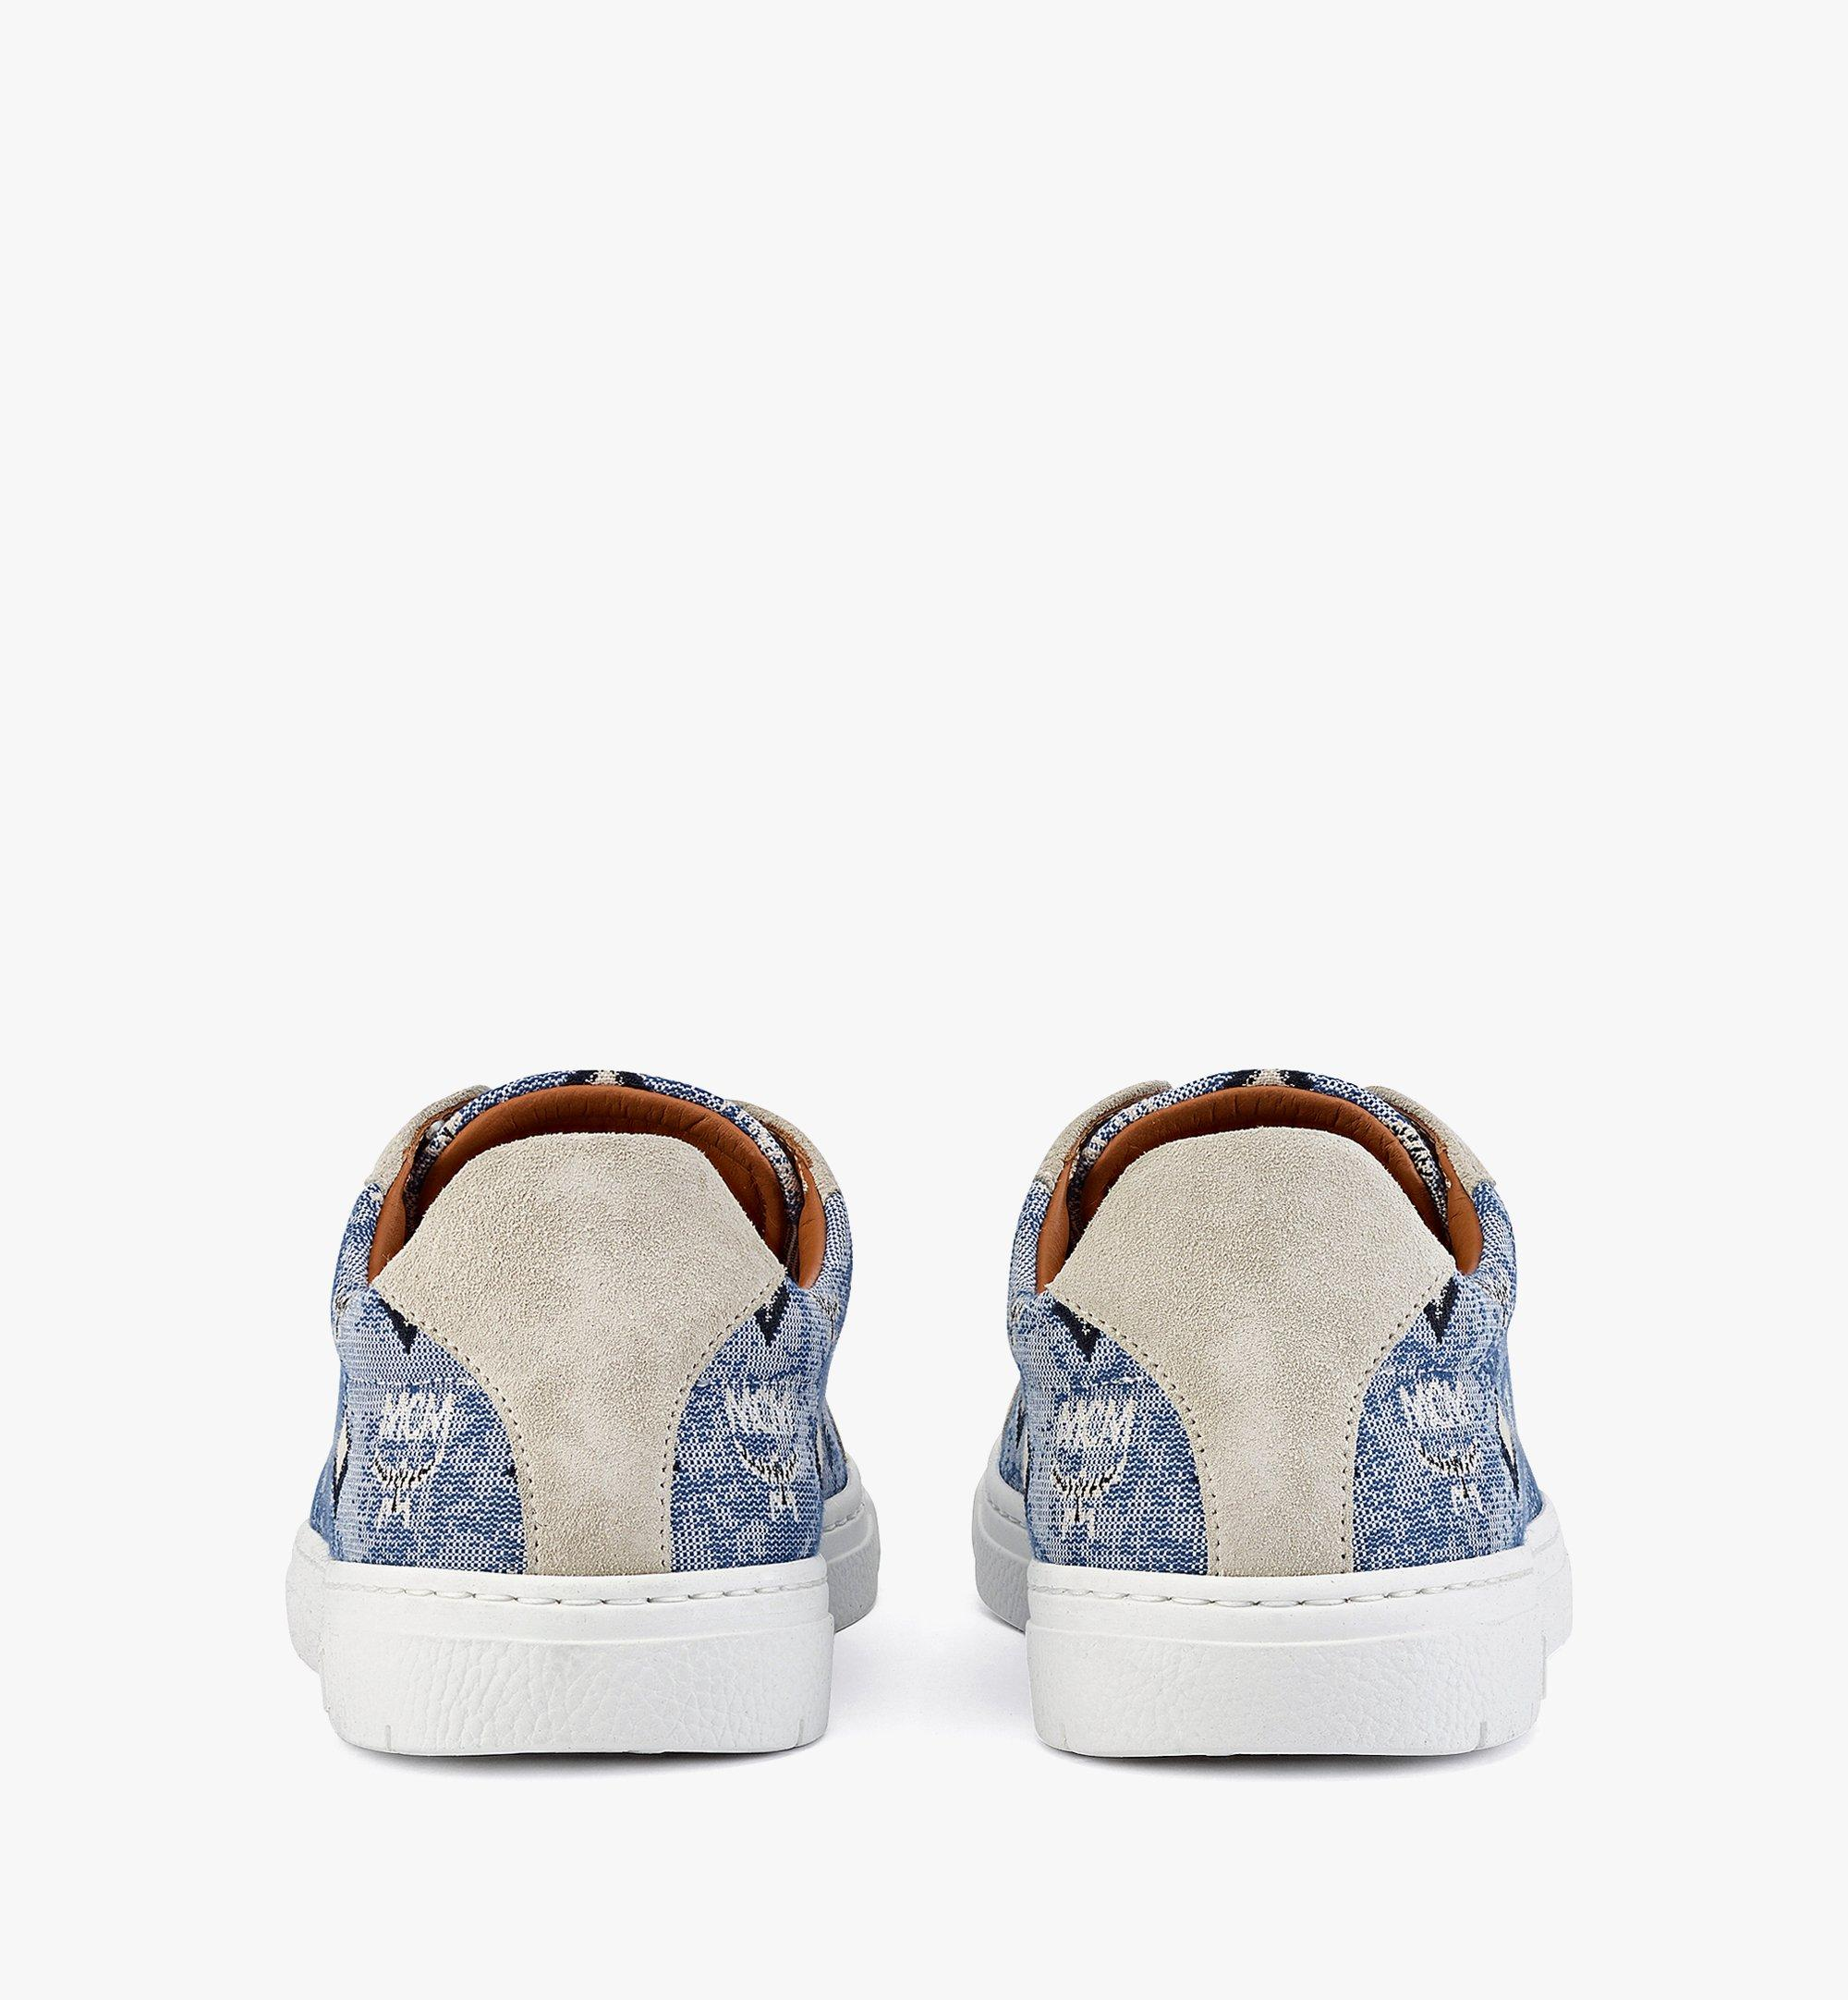 MCM Women's Terrain Lo Sneakers in Vintage Jacquard Monogram Blue MESBATQ02LU036 Alternate View 2